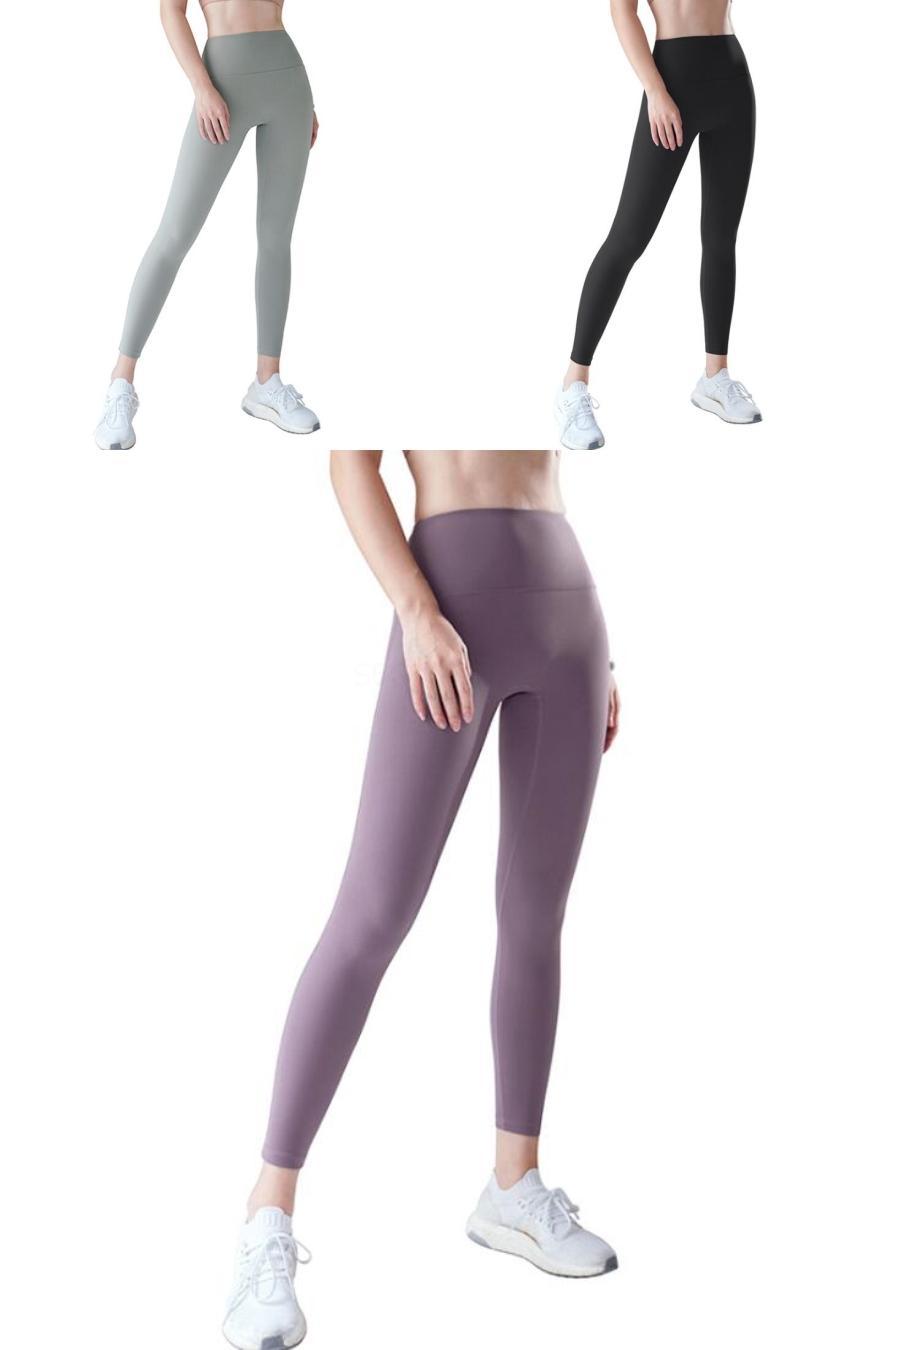 Sports Gym Leggings Fitness Yoga Jeggings Ip Push Up Skinny Pencil Pants Women Slim Elastic Legging Sexy Stretch Tights Foot Pants B25857#232